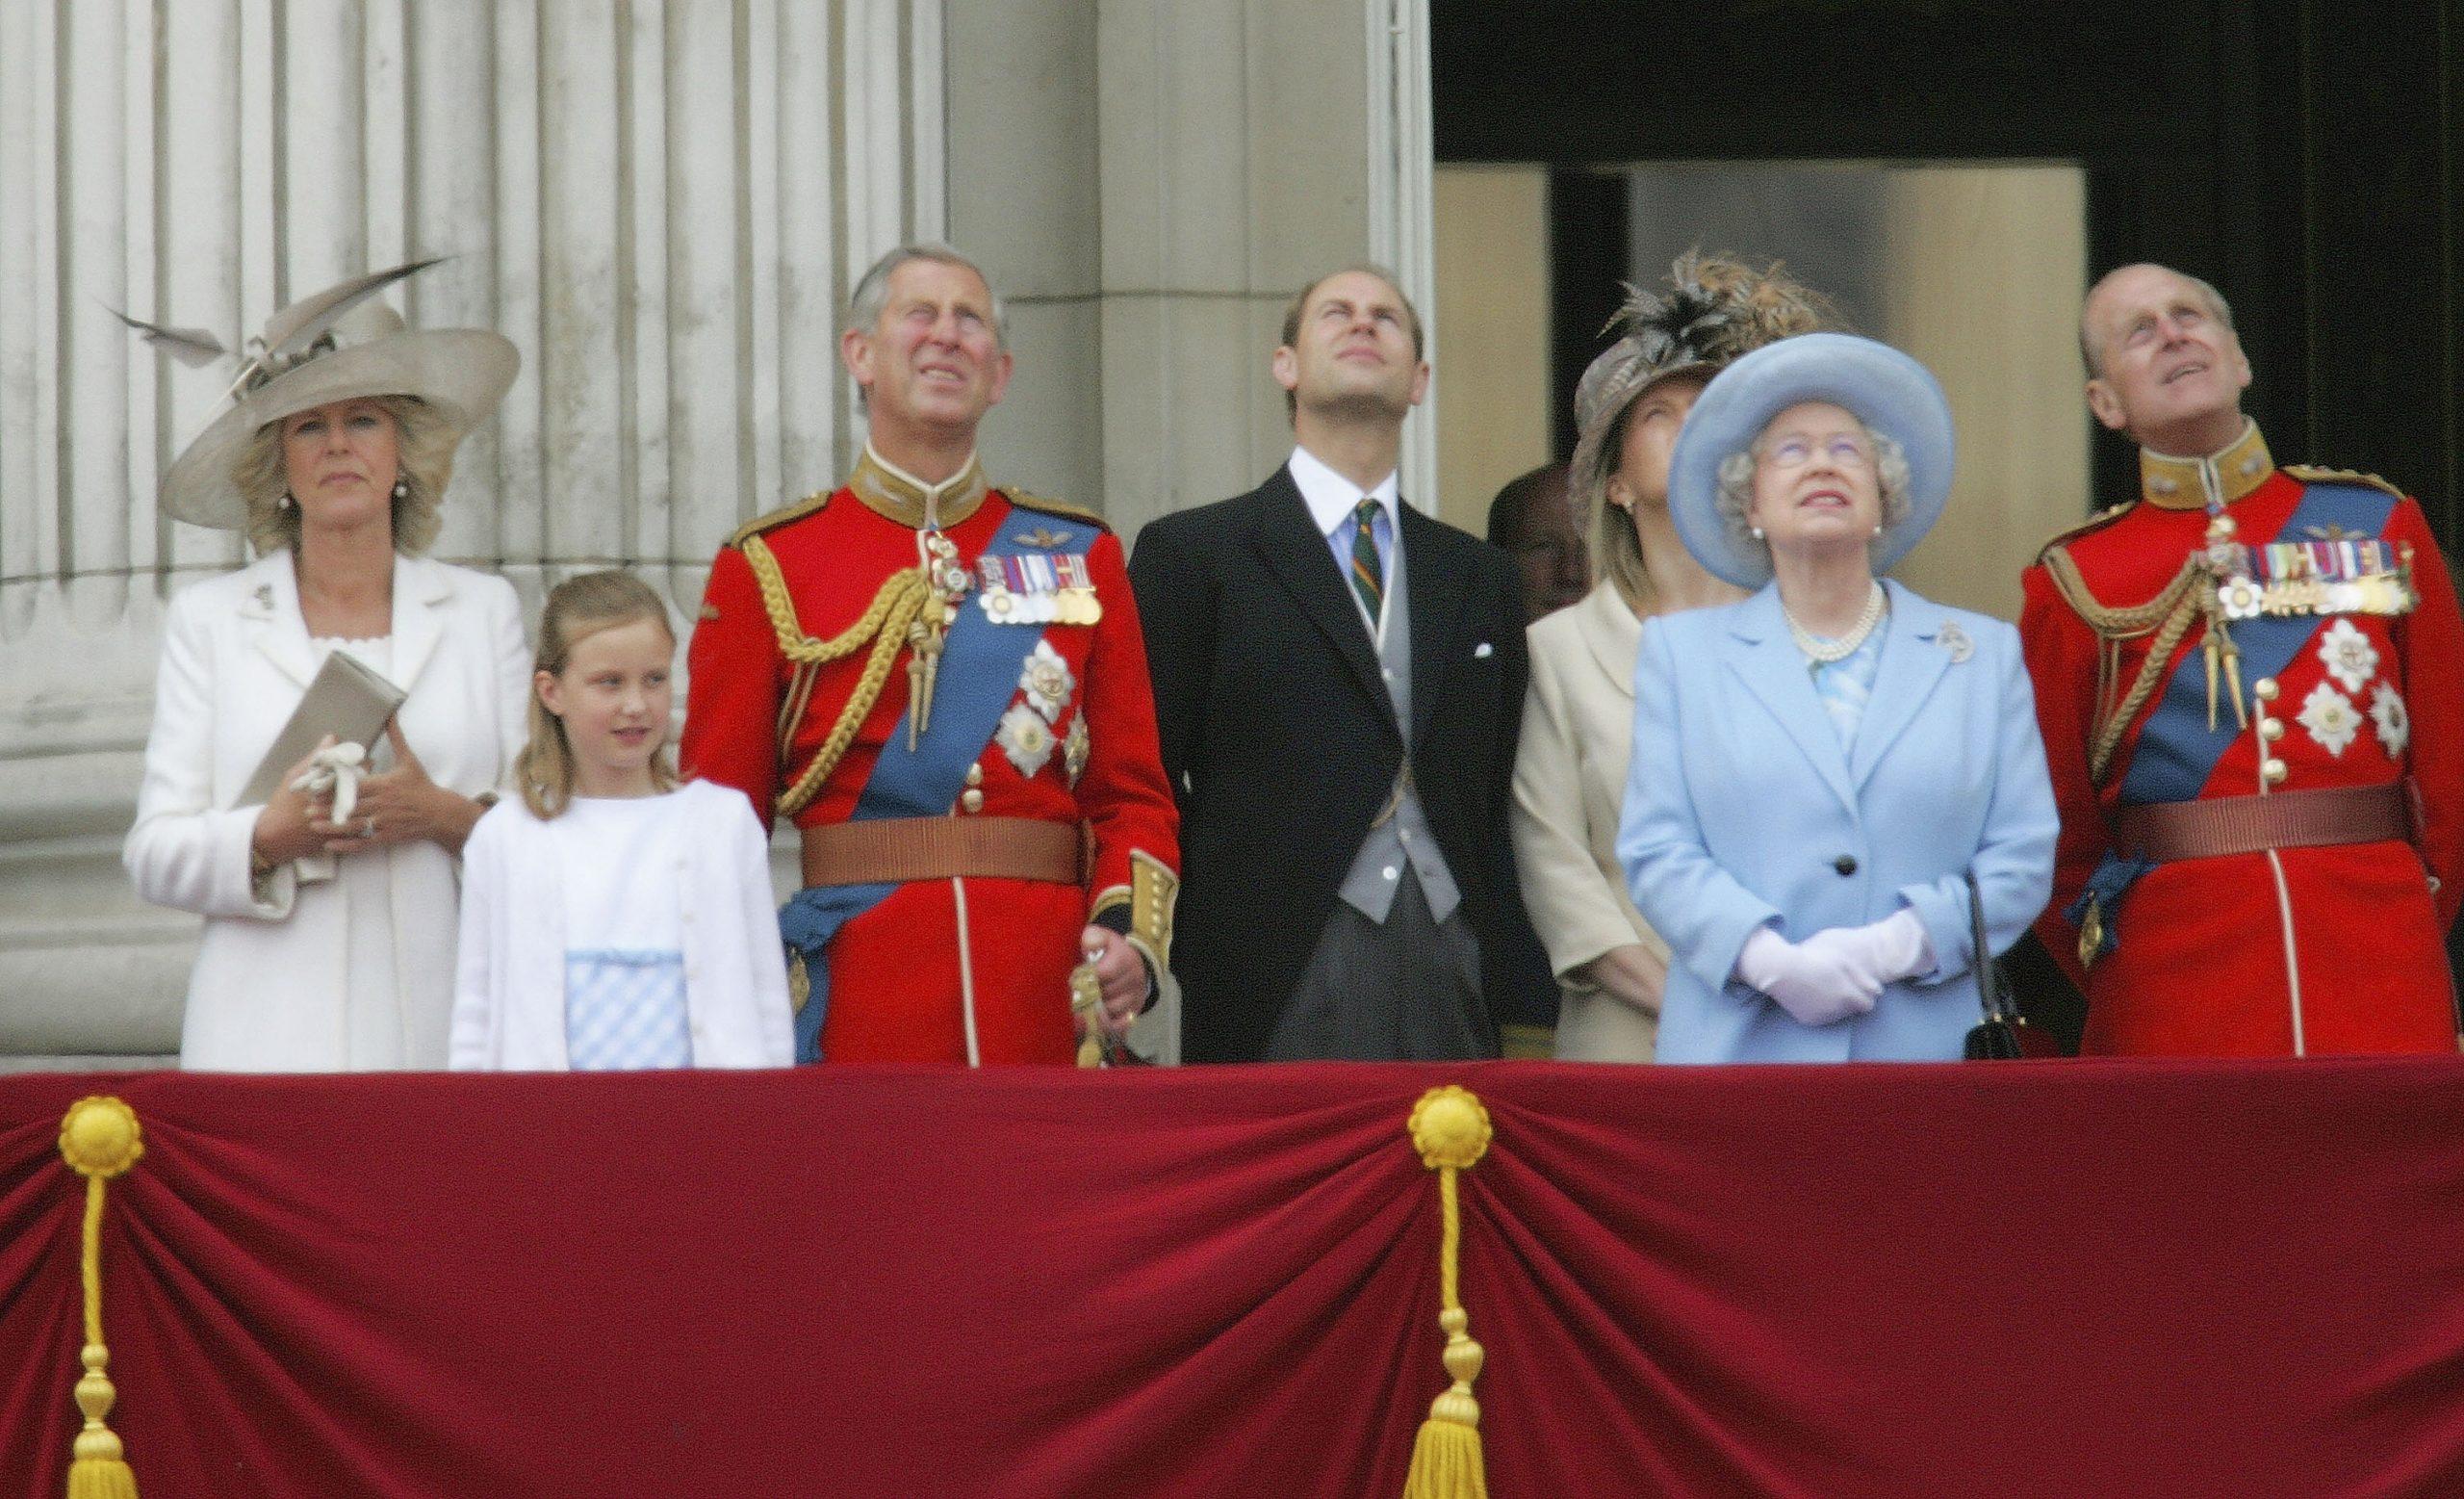 La regina Elisabetta ha fatto litigare Carlo ed Edoardo